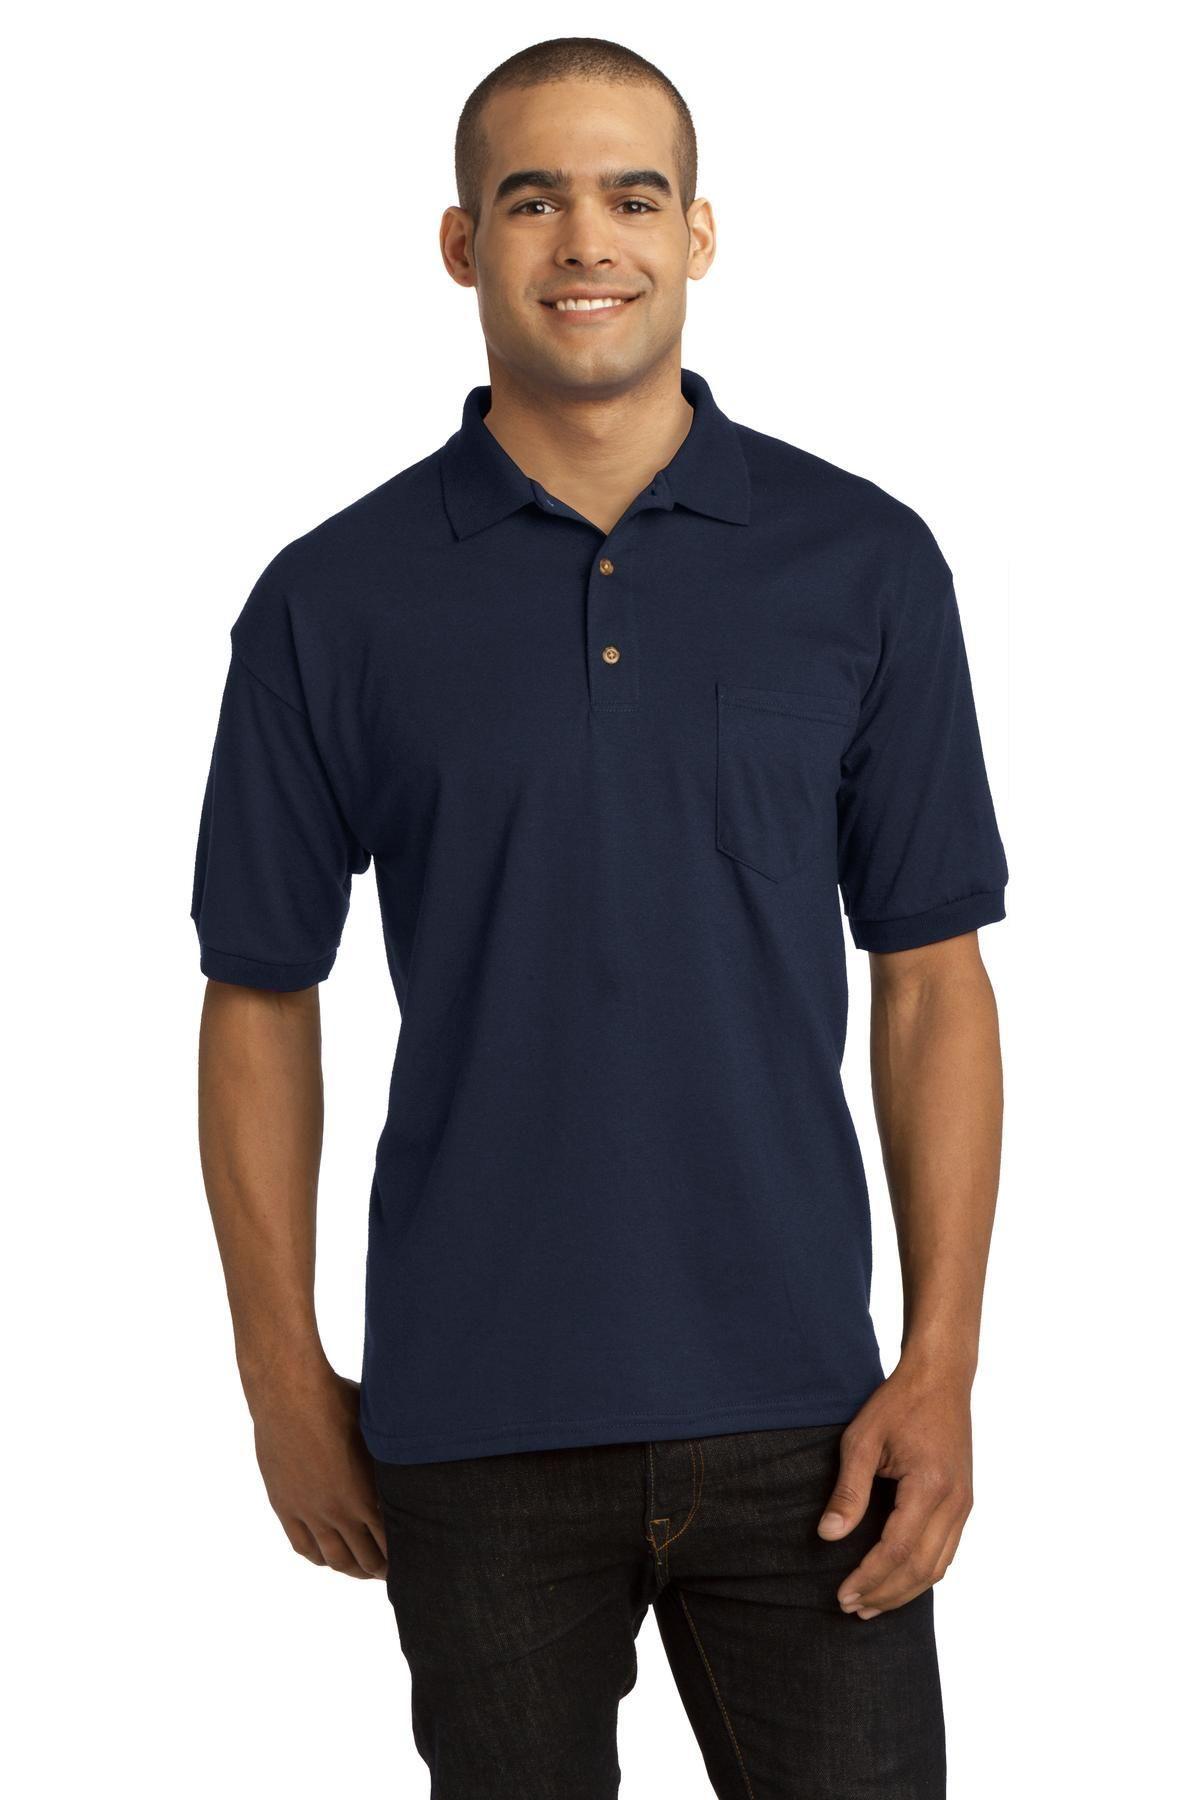 1a87250f Gildan Dryblend Pocket T Shirts « Alzheimer's Network of Oregon